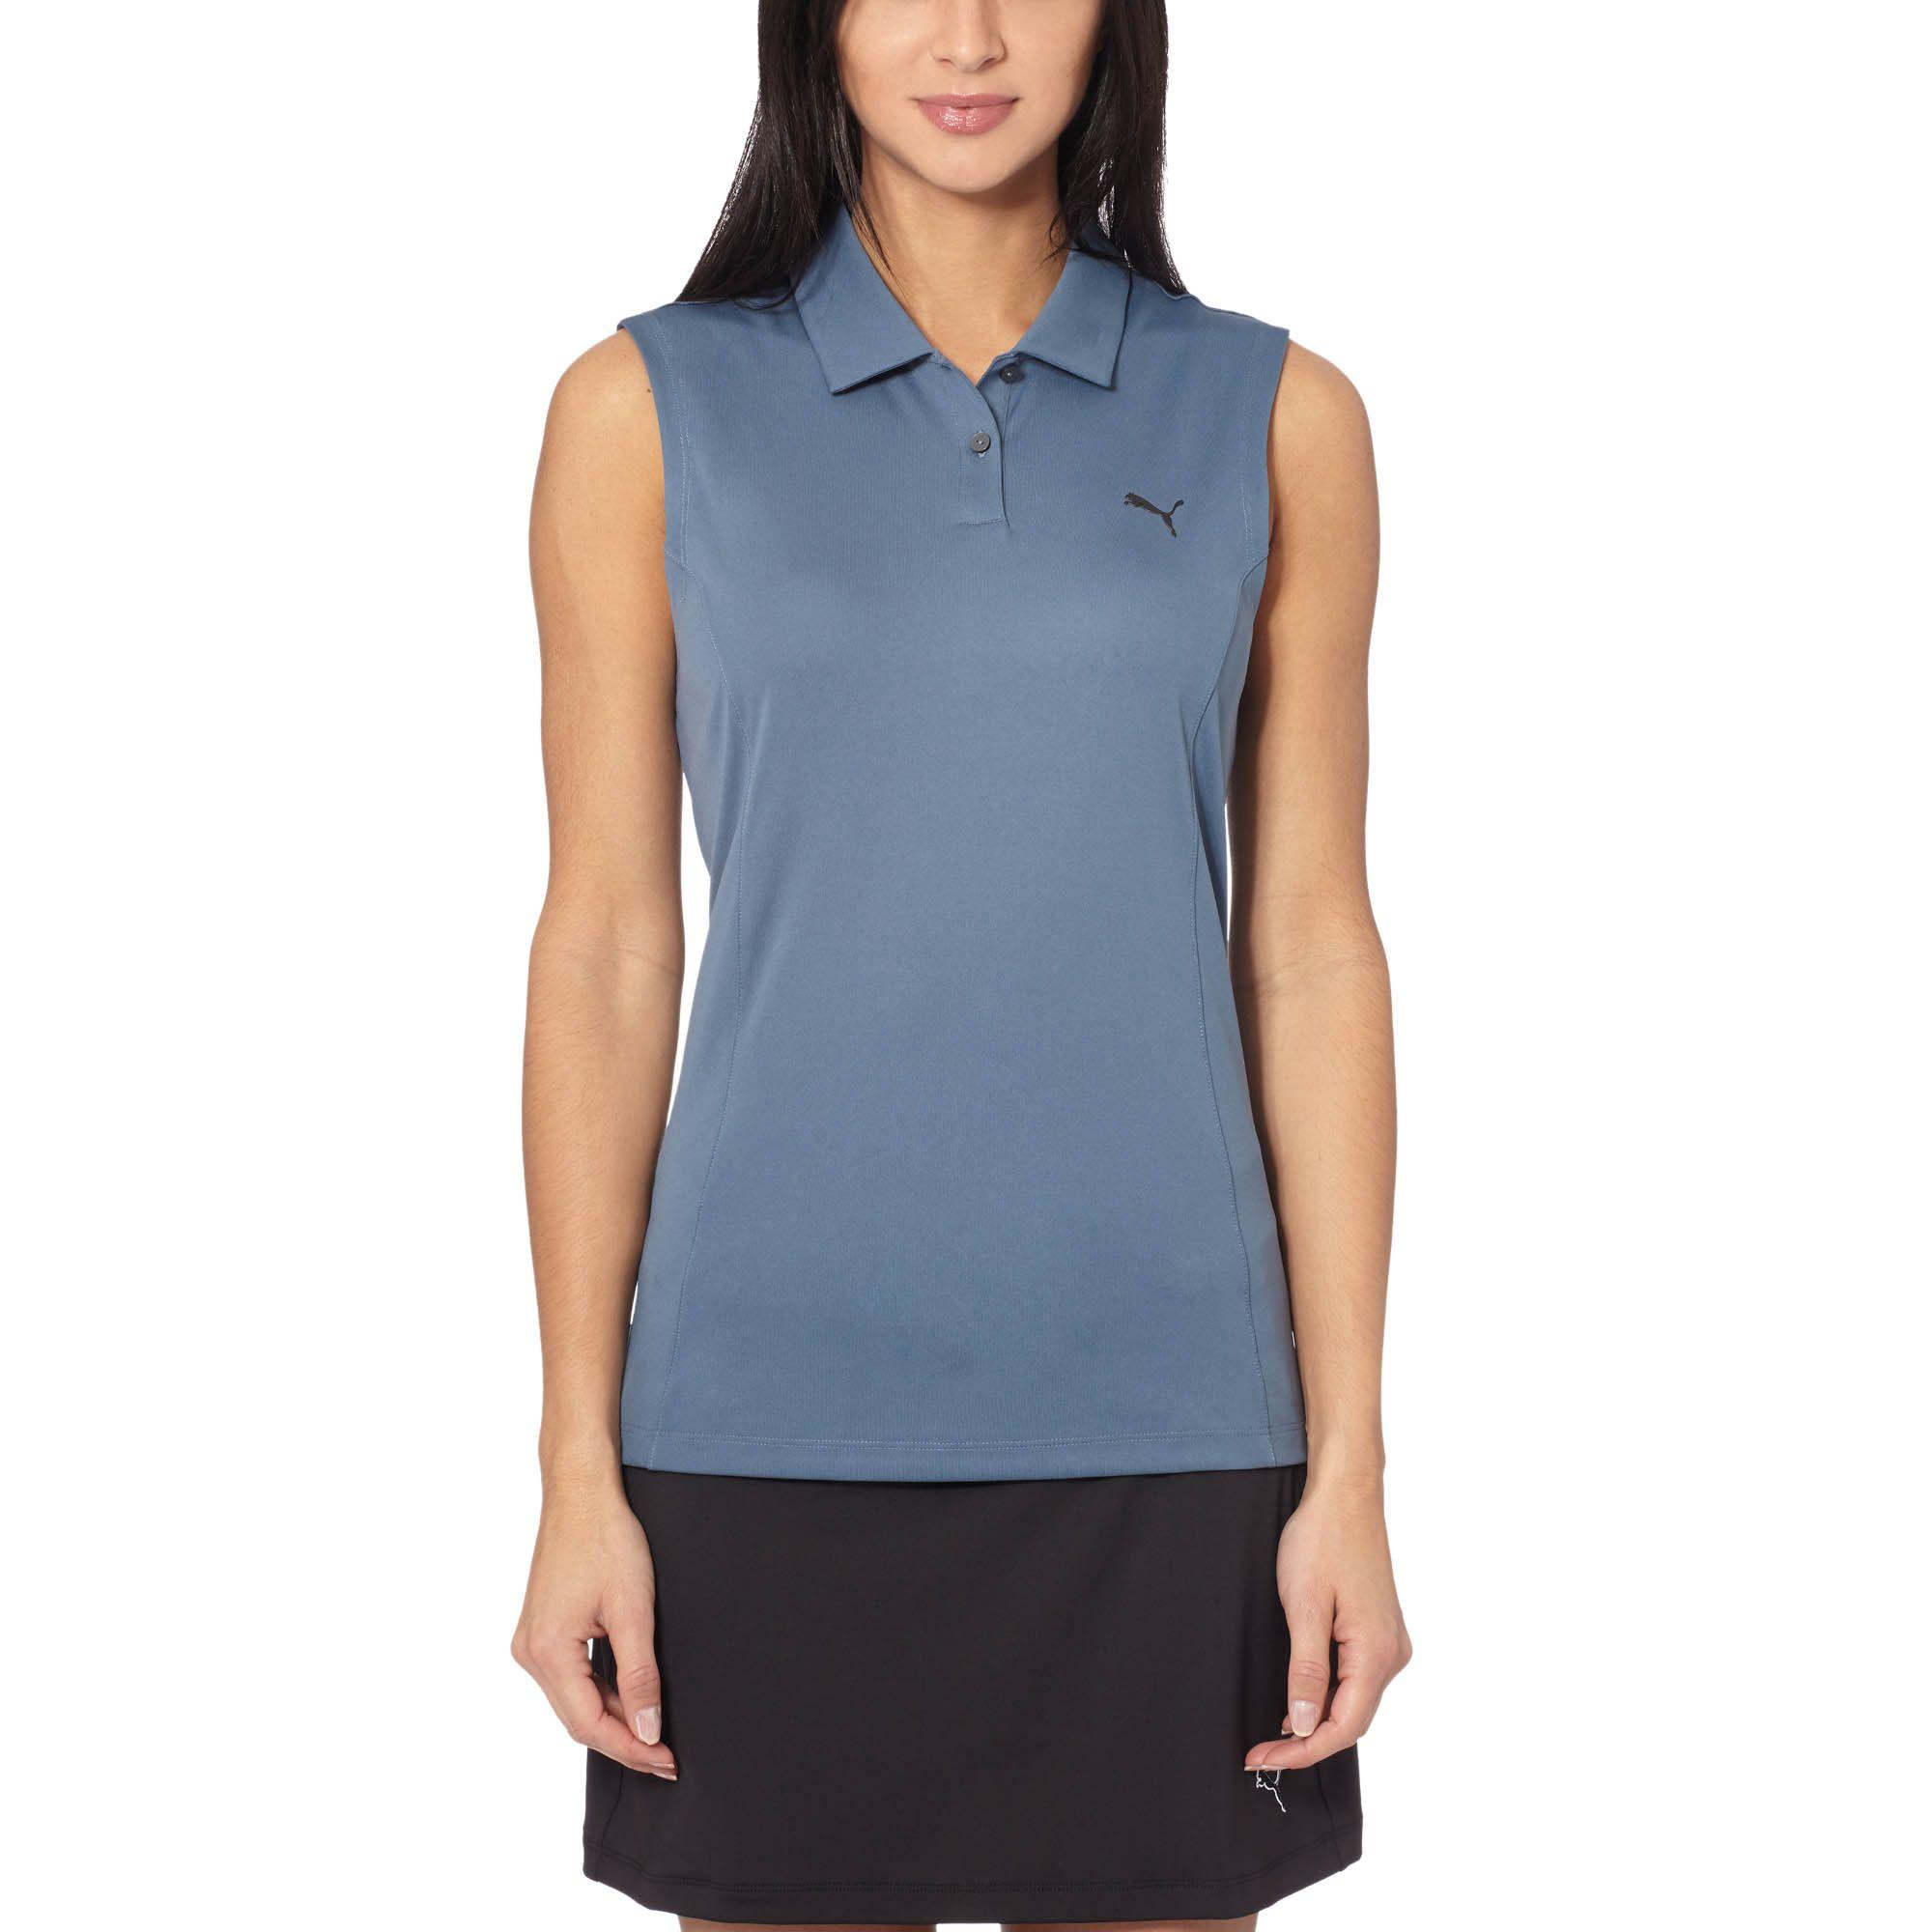 Puma Women's Sleeveless Golf Shirts